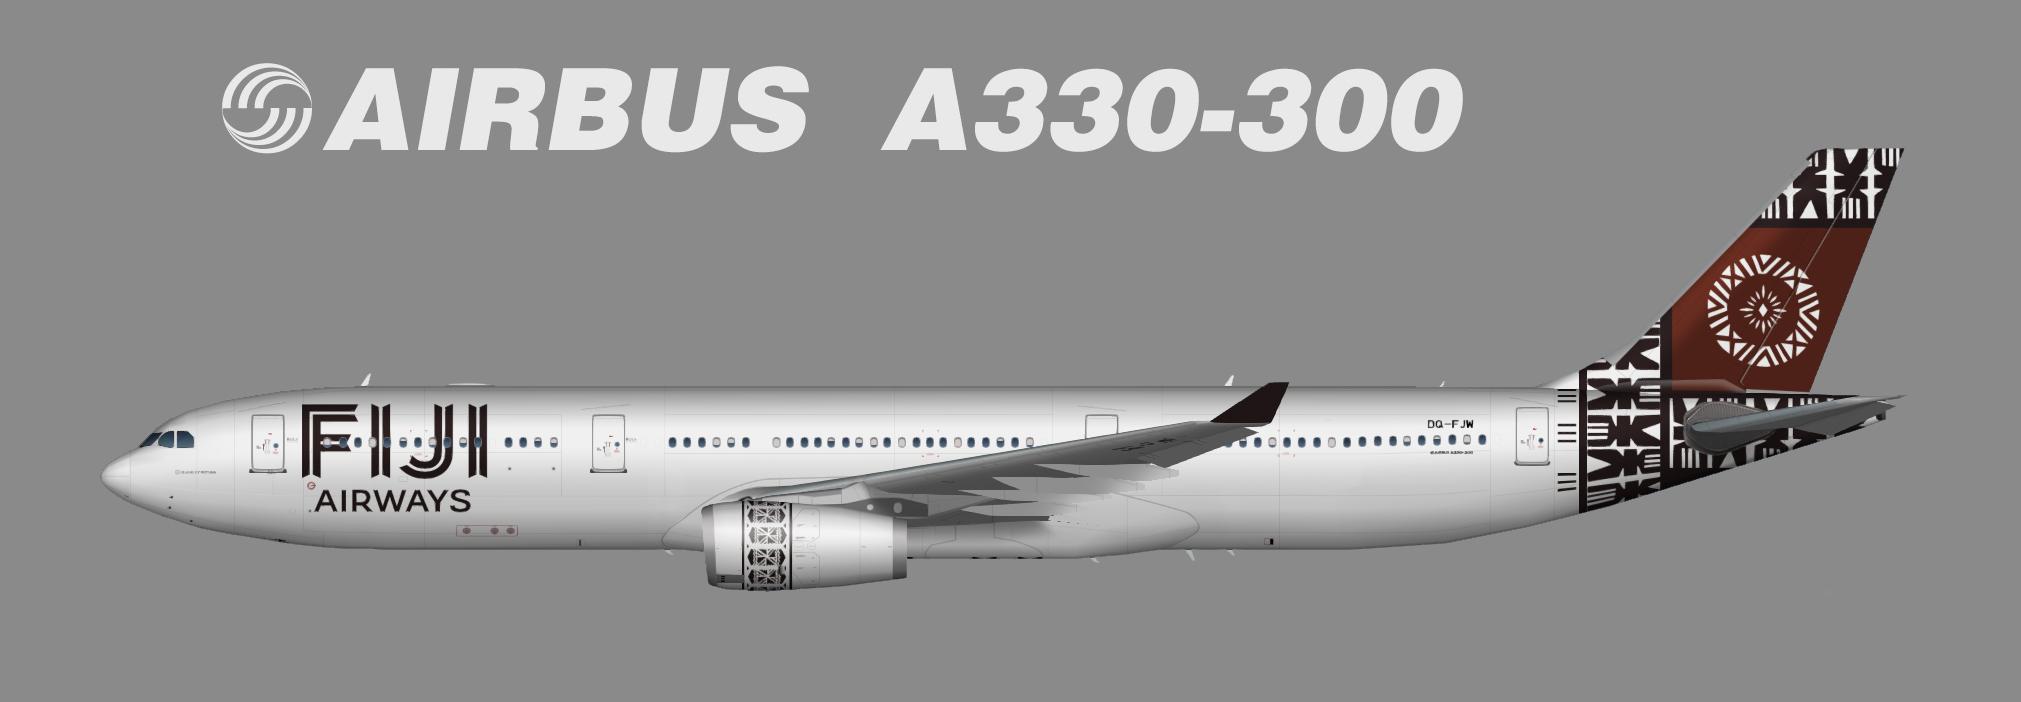 Fiji Airways Airbus A330-300